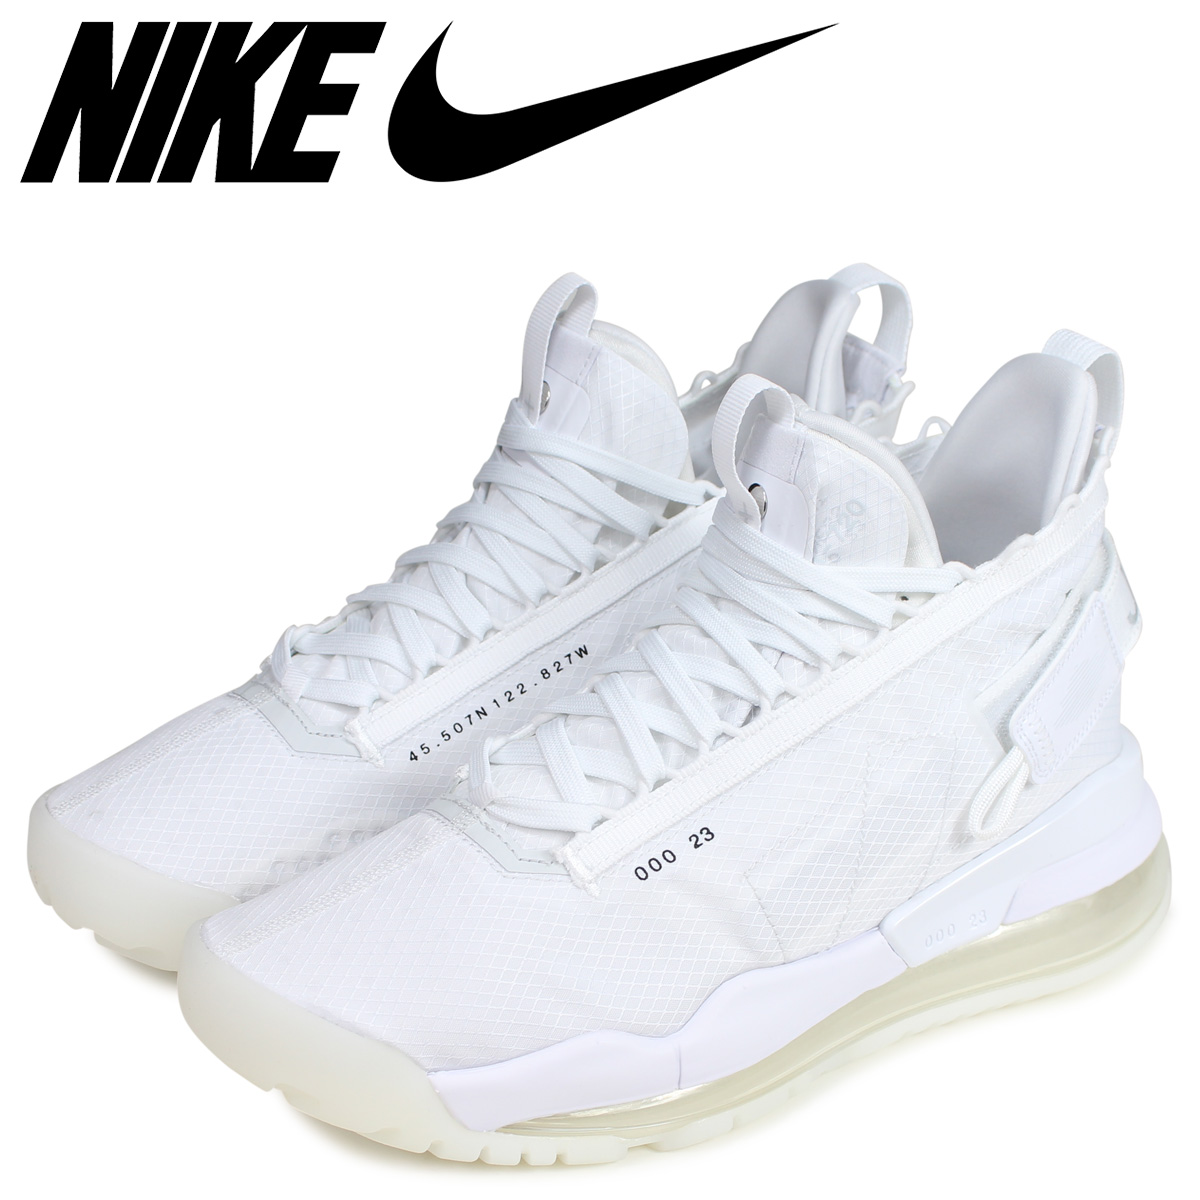 sale retailer 1d37f 559f8 NIKE Nike Jordan proto max 720 sneakers men JORDAN PROTO-MAX 720 white  white BQ6623-100  4 25 Shinnyu load